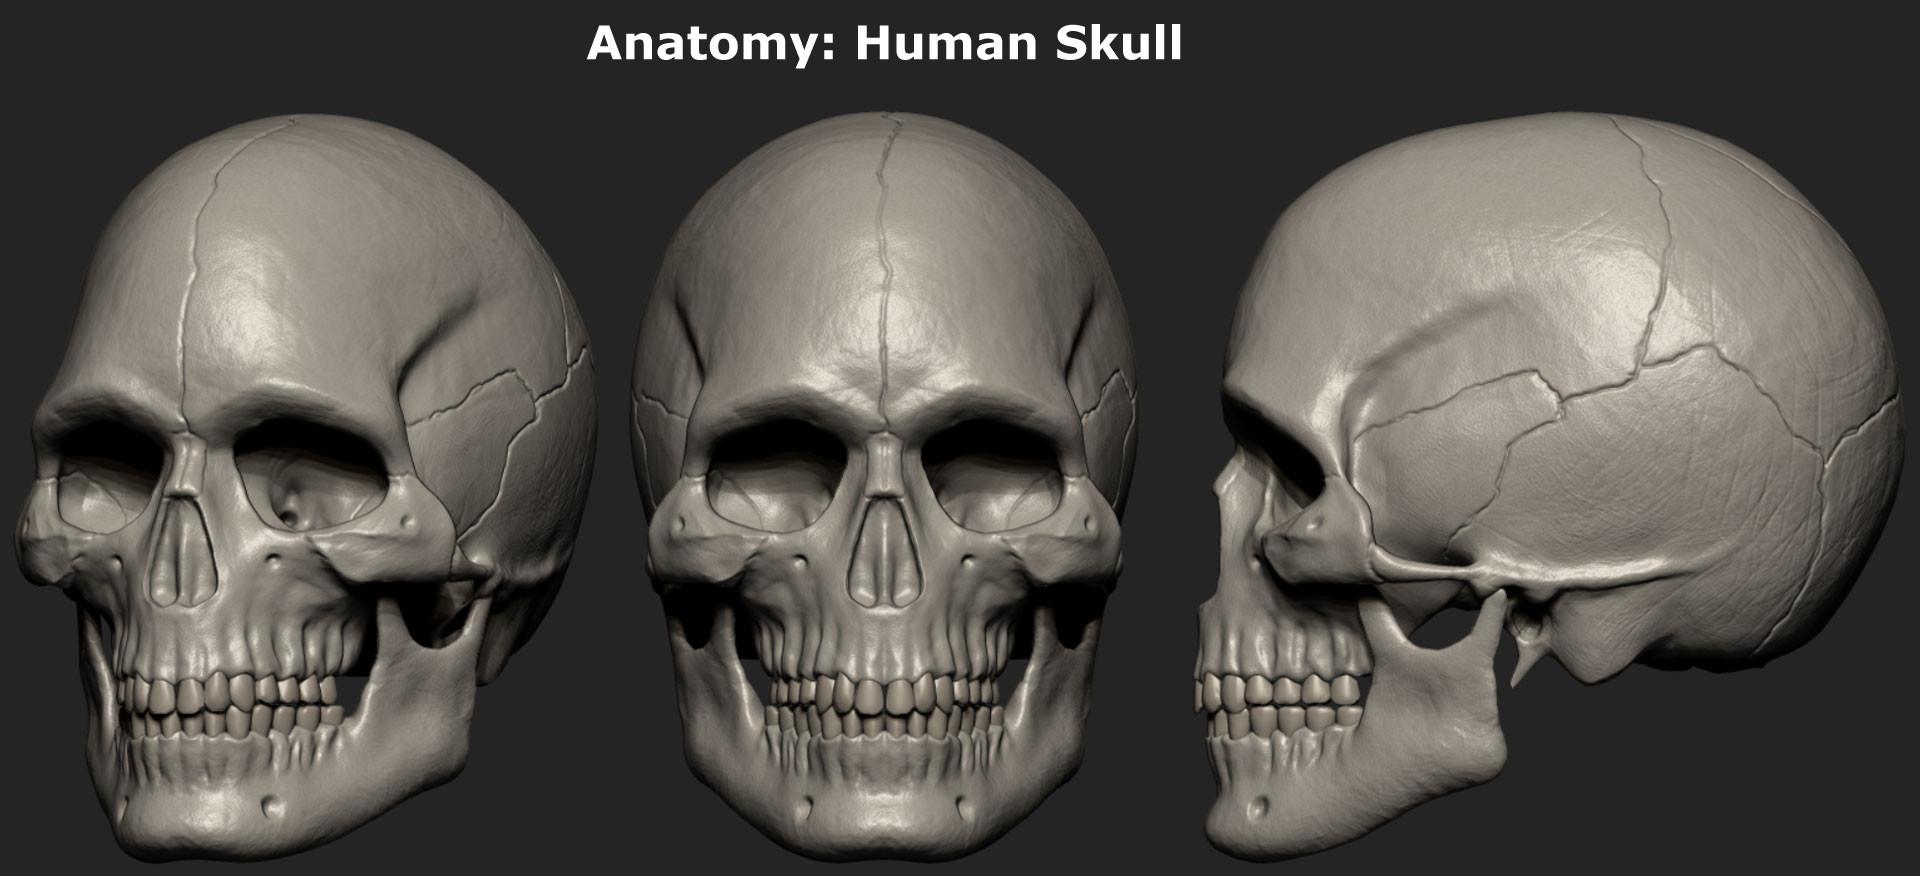 ArtStation - Anatomy: Human Skull, Shazad Ali